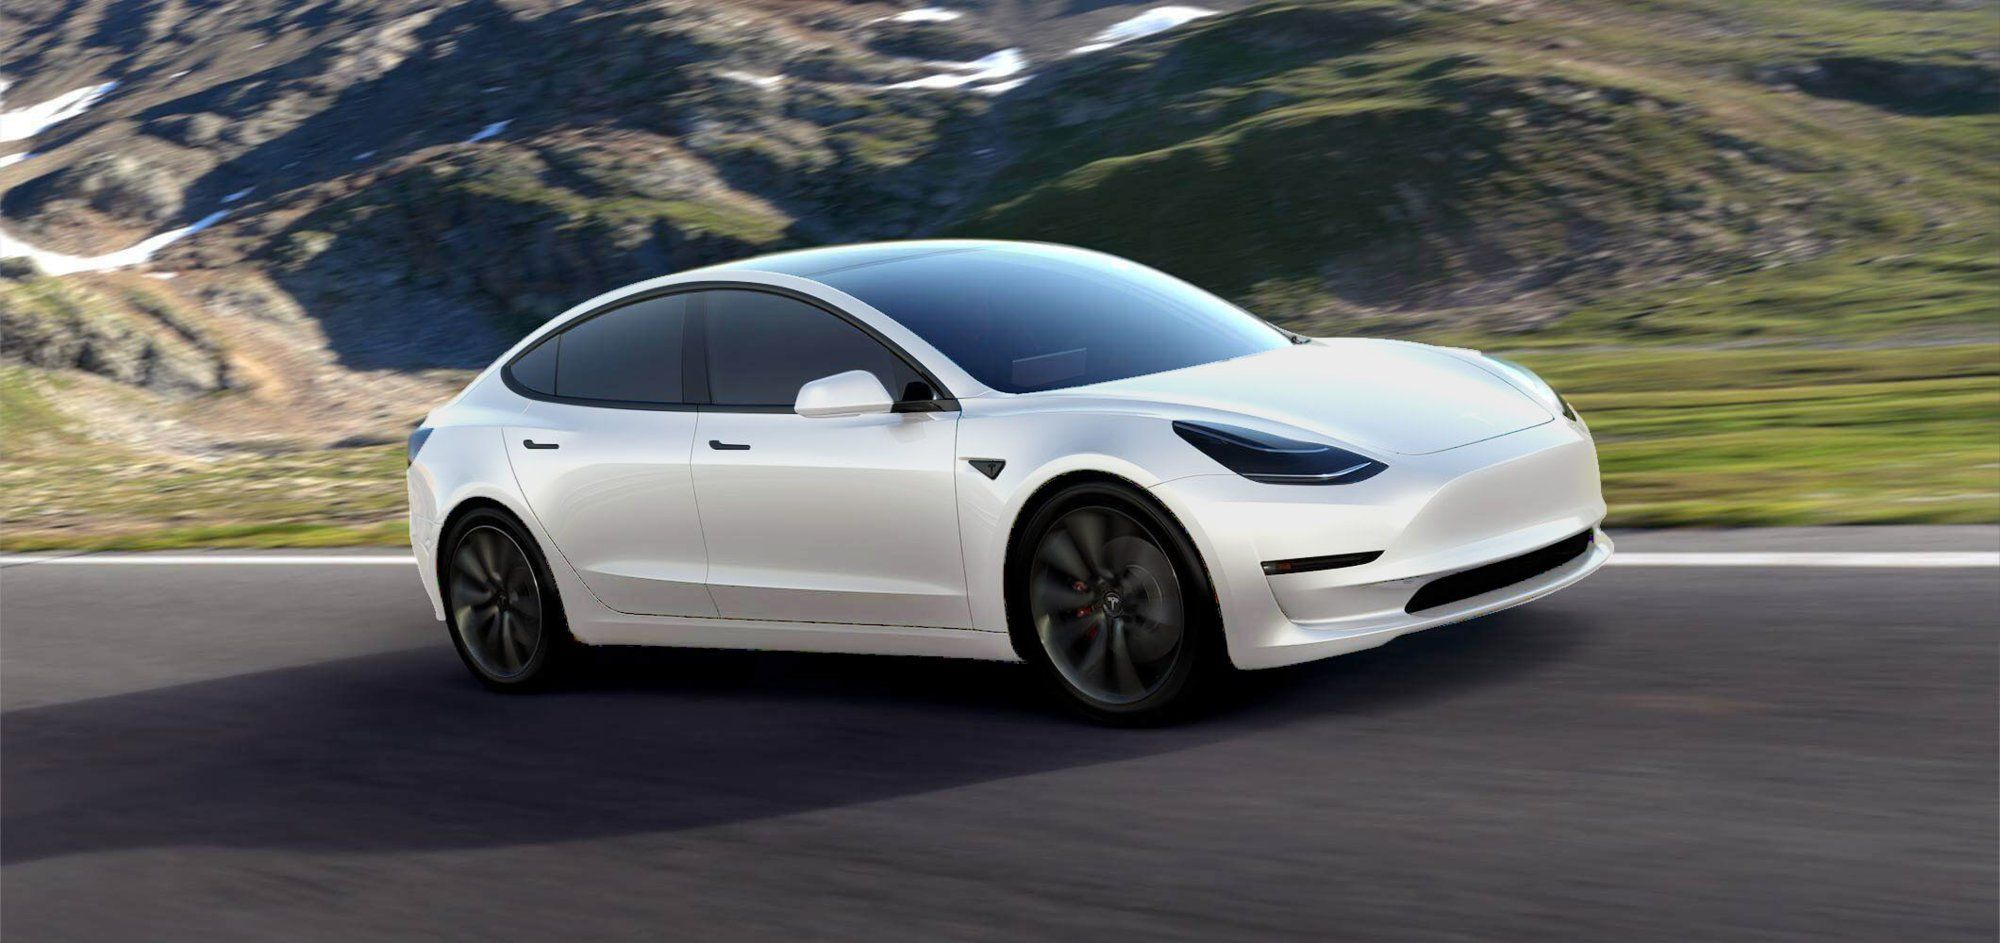 Noleggio Tesla Roma Rent Model 3 Noleggio con un click Ricarica Full 100%